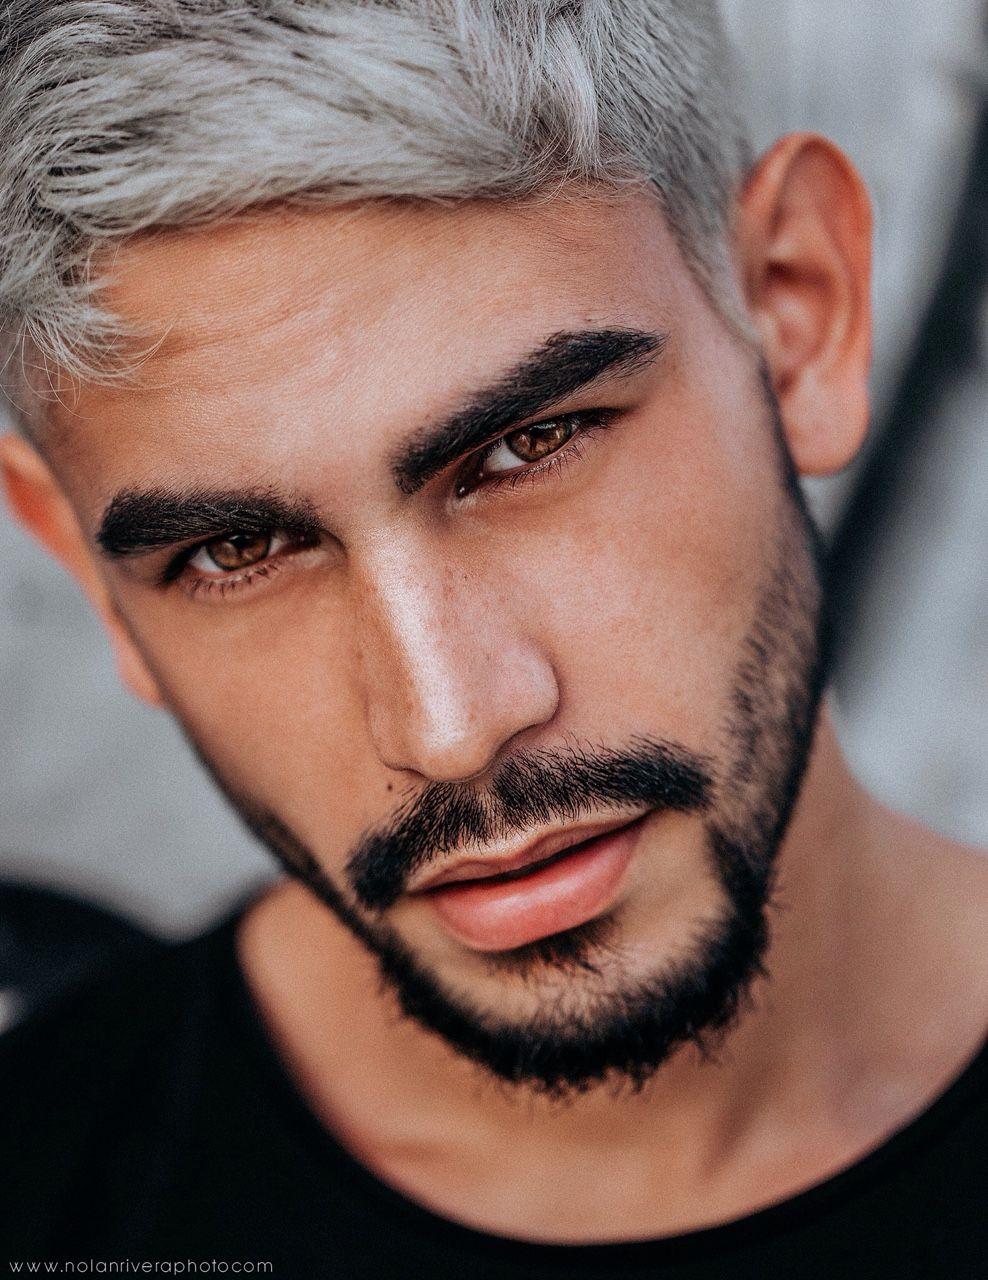 Армяне со светлыми волосами фото